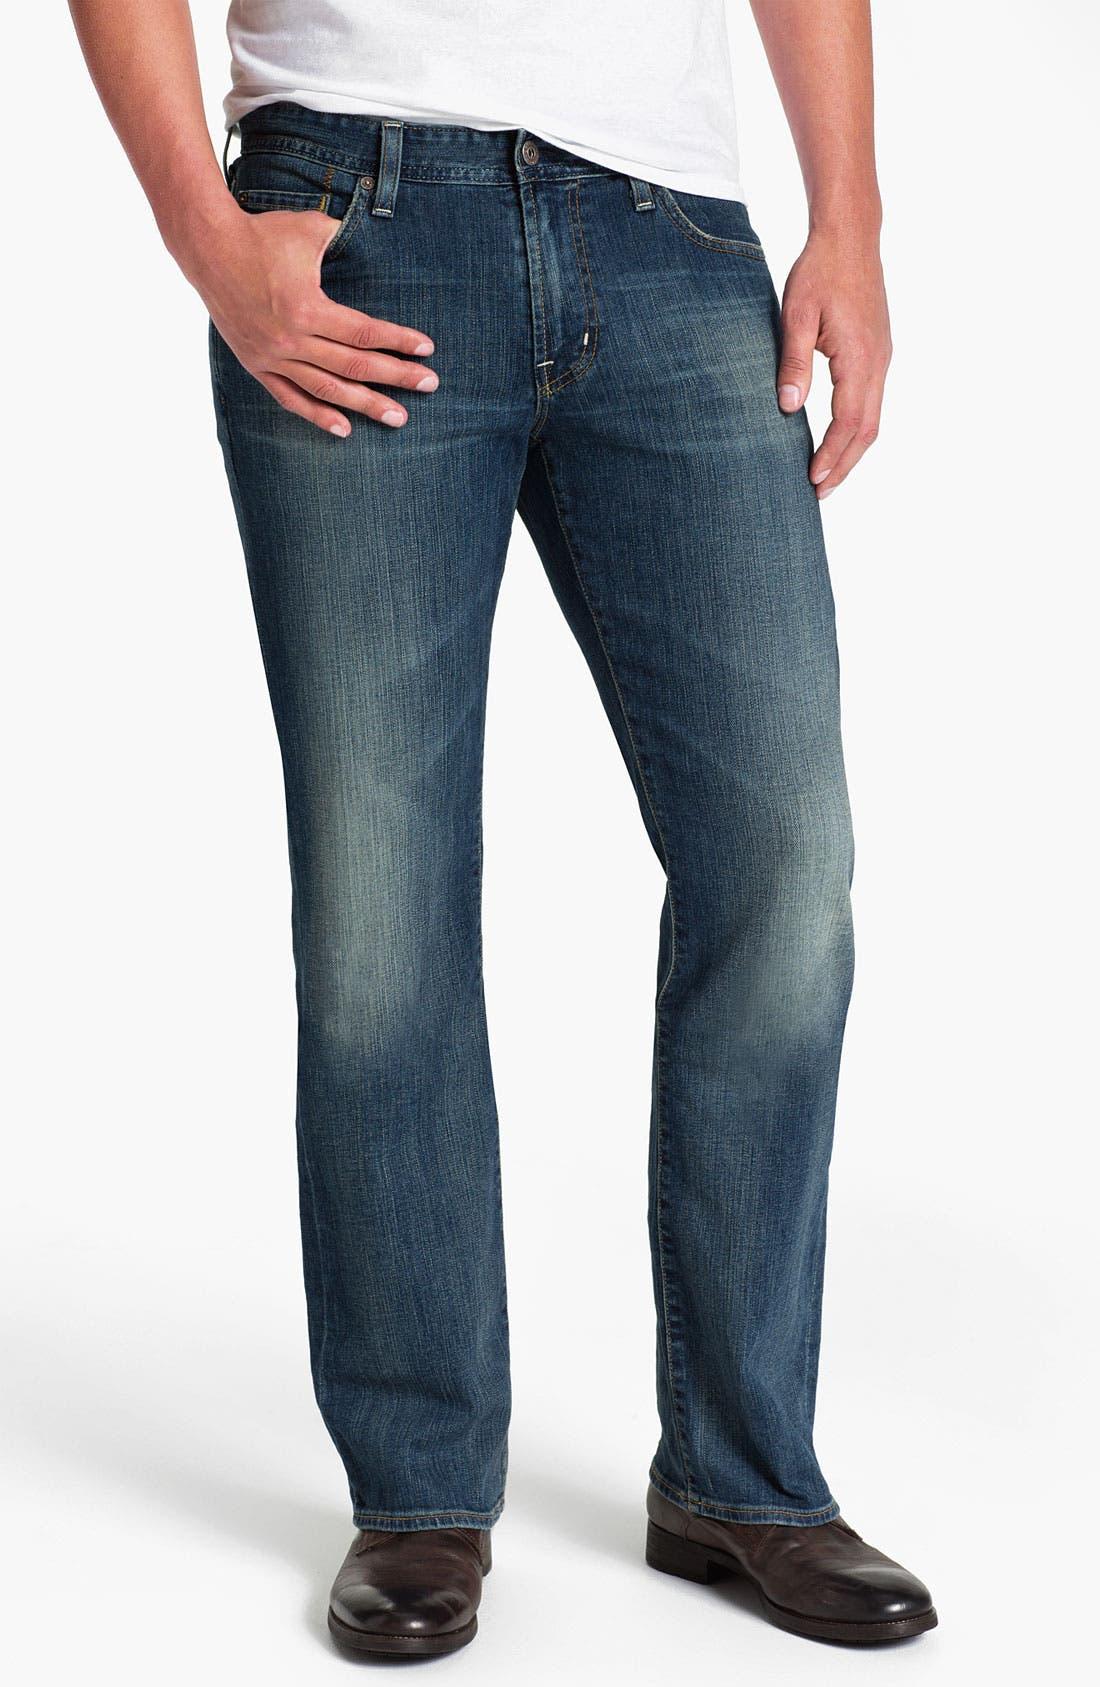 Alternate Image 1 Selected - AG Jeans 'Regent' Bootcut Jeans (Abbott)